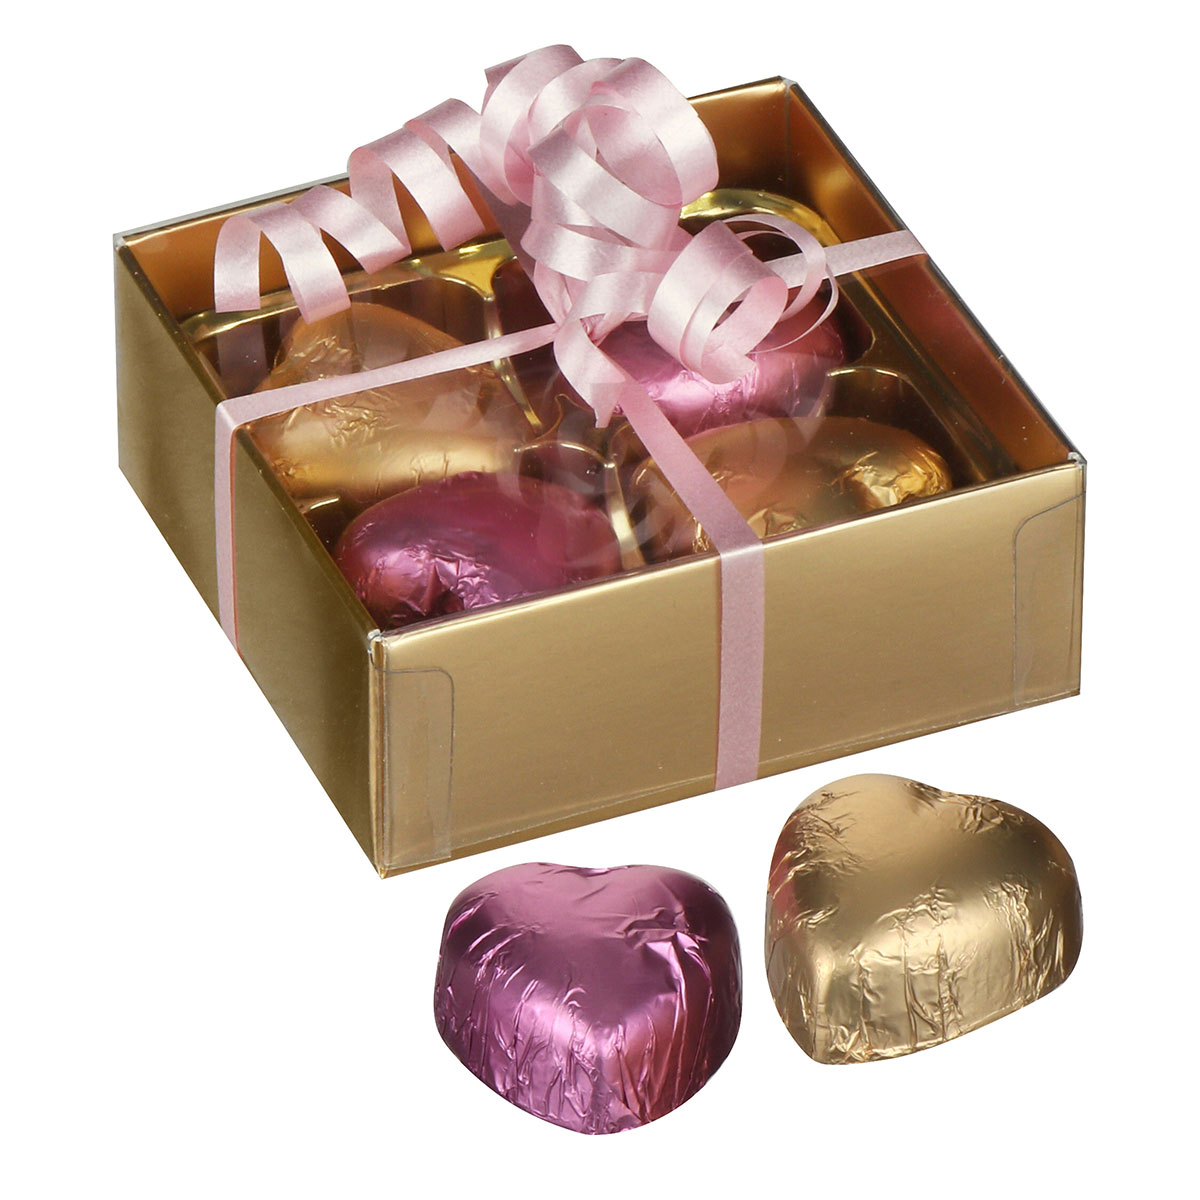 4 Hearts Belgian Chocolates in Gold Presentation Box